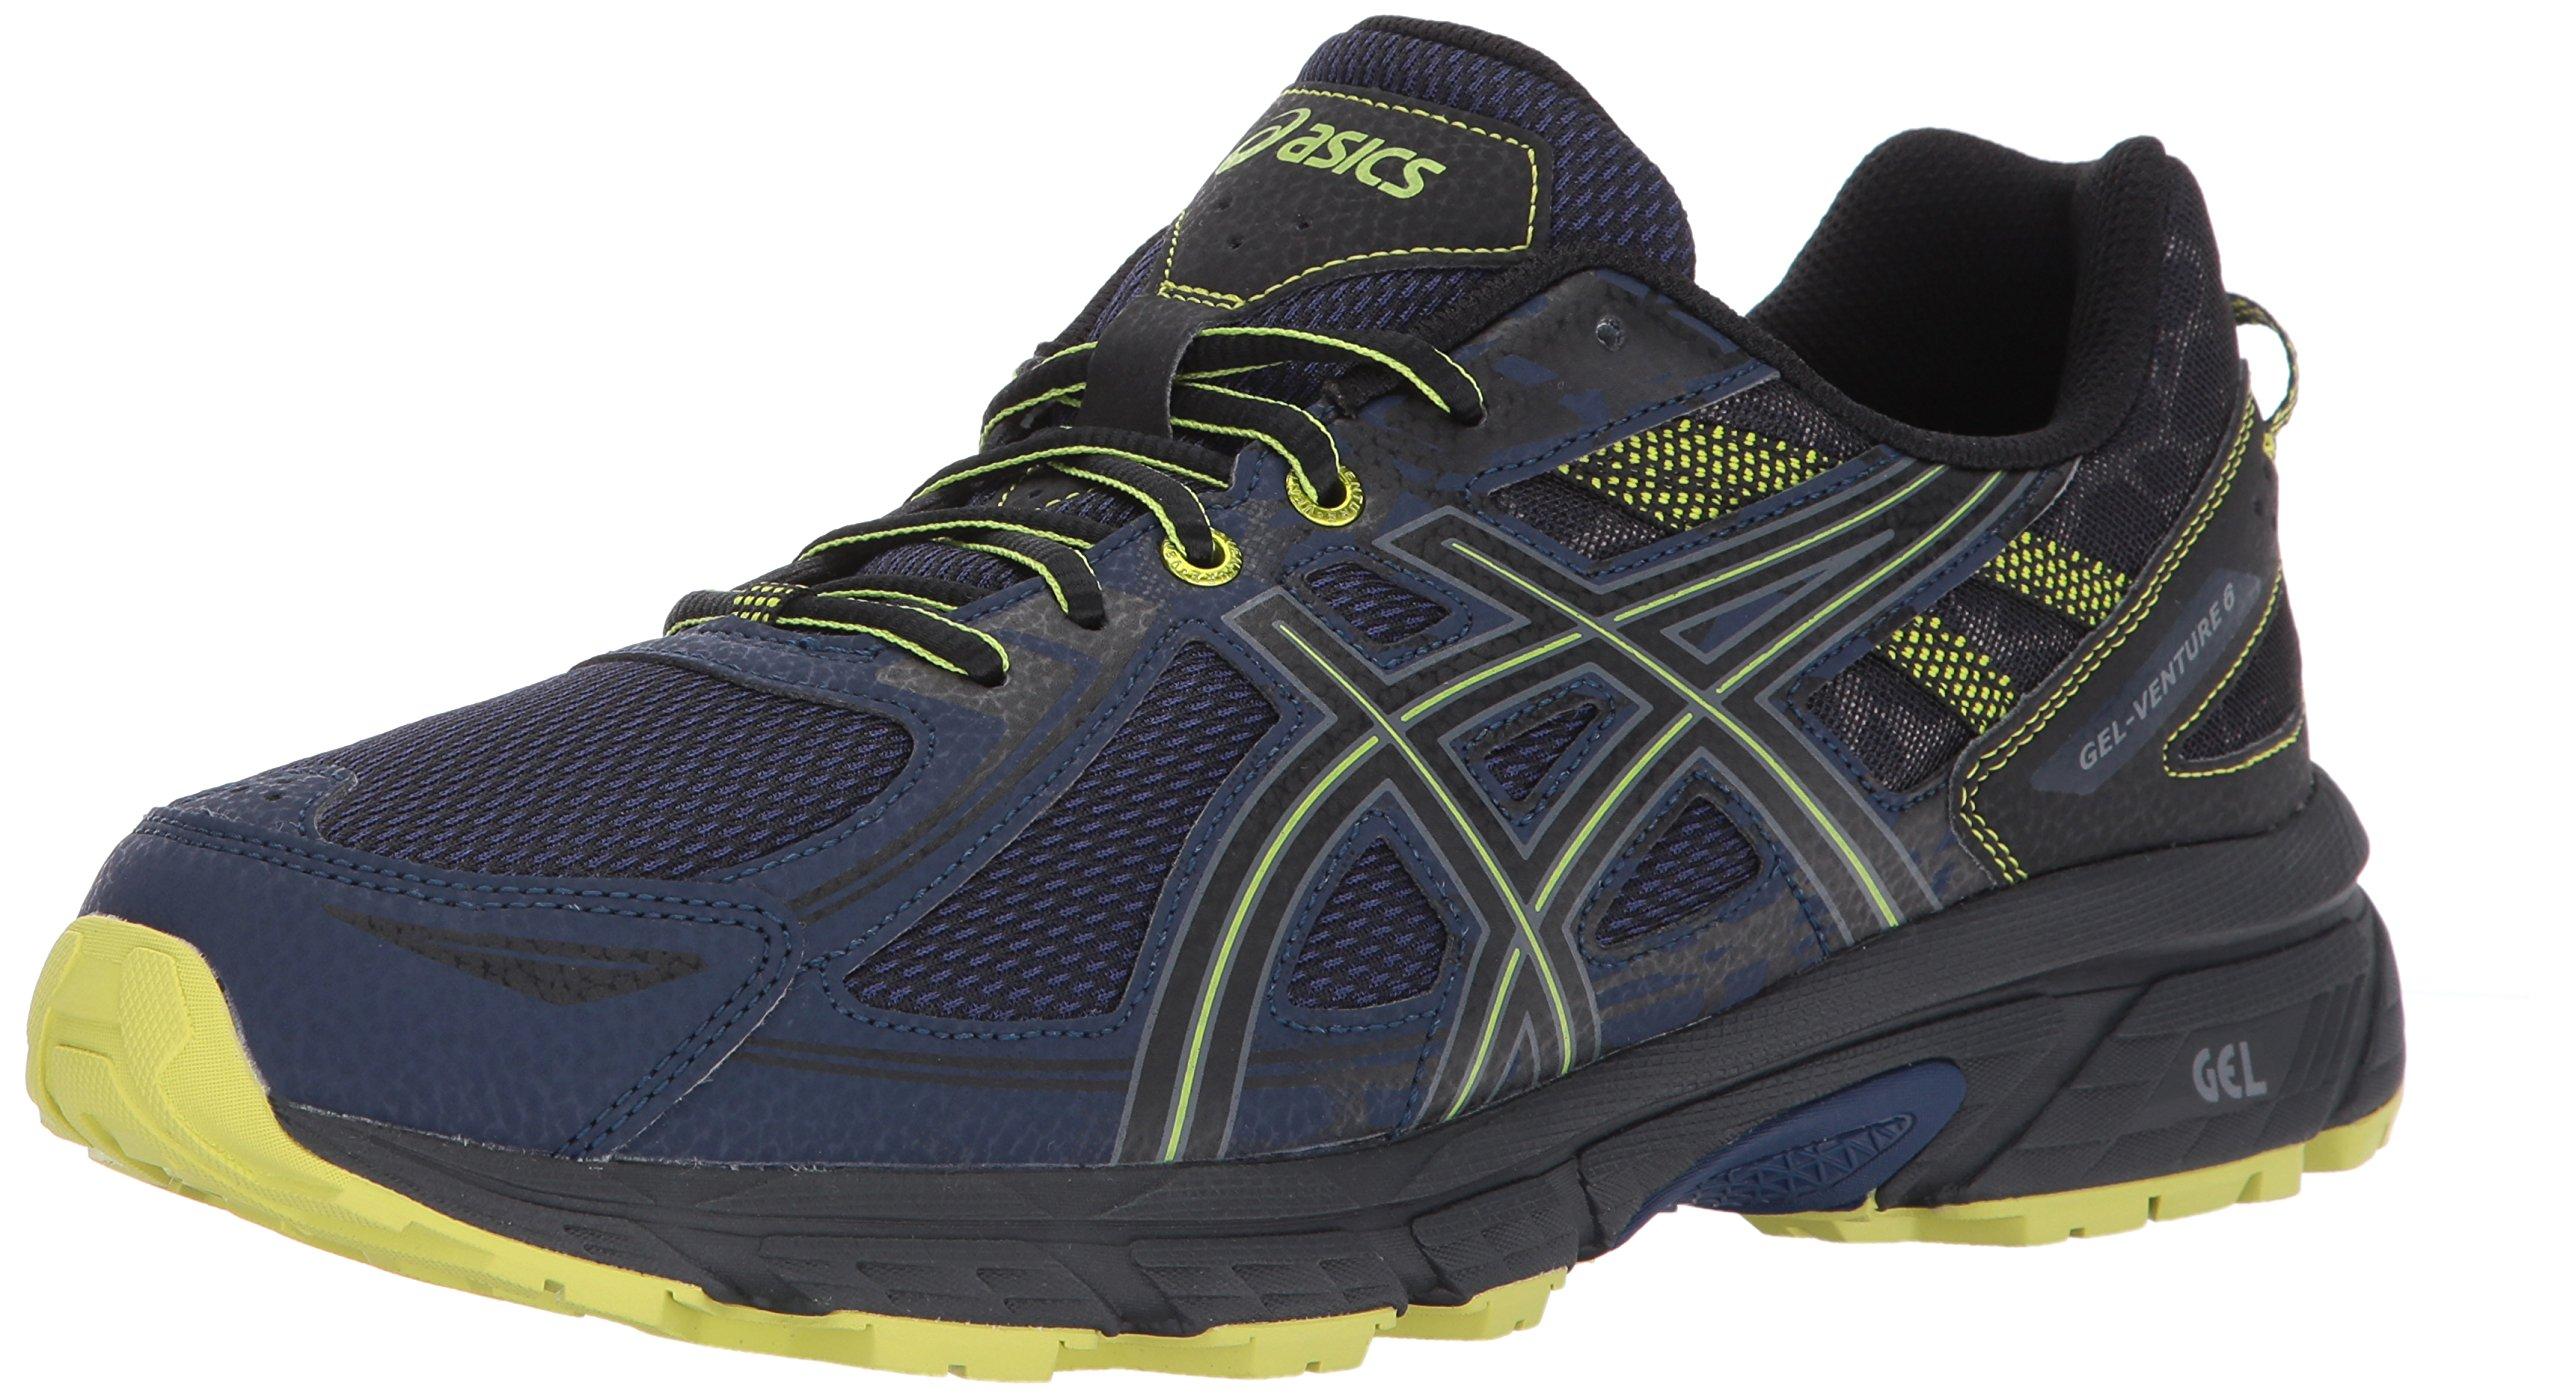 ASICS Mens Gel-Venture 6 Running Shoe, Indigo Blue/Black/Energy Green, 12 Medium US by ASICS